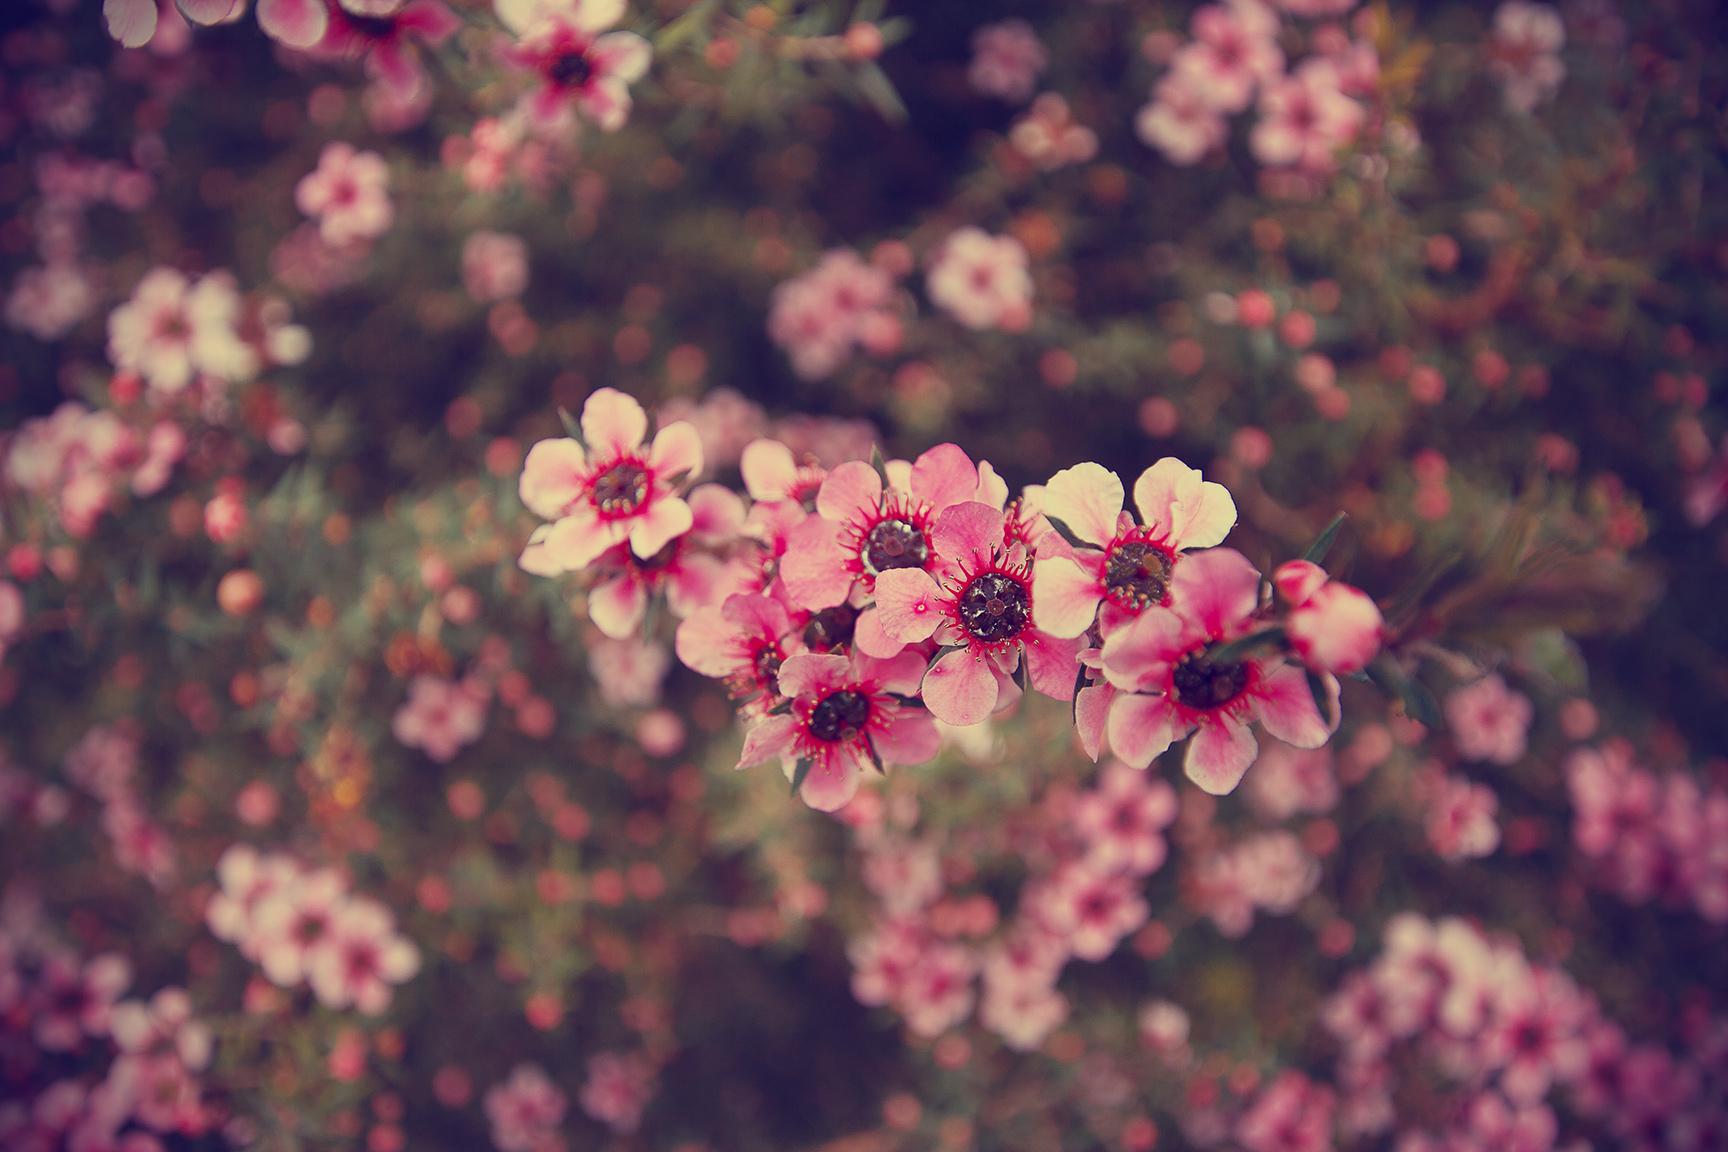 Vintage Flower Wallpaper Iphone Tumblr Flowers Photo 1728x1152